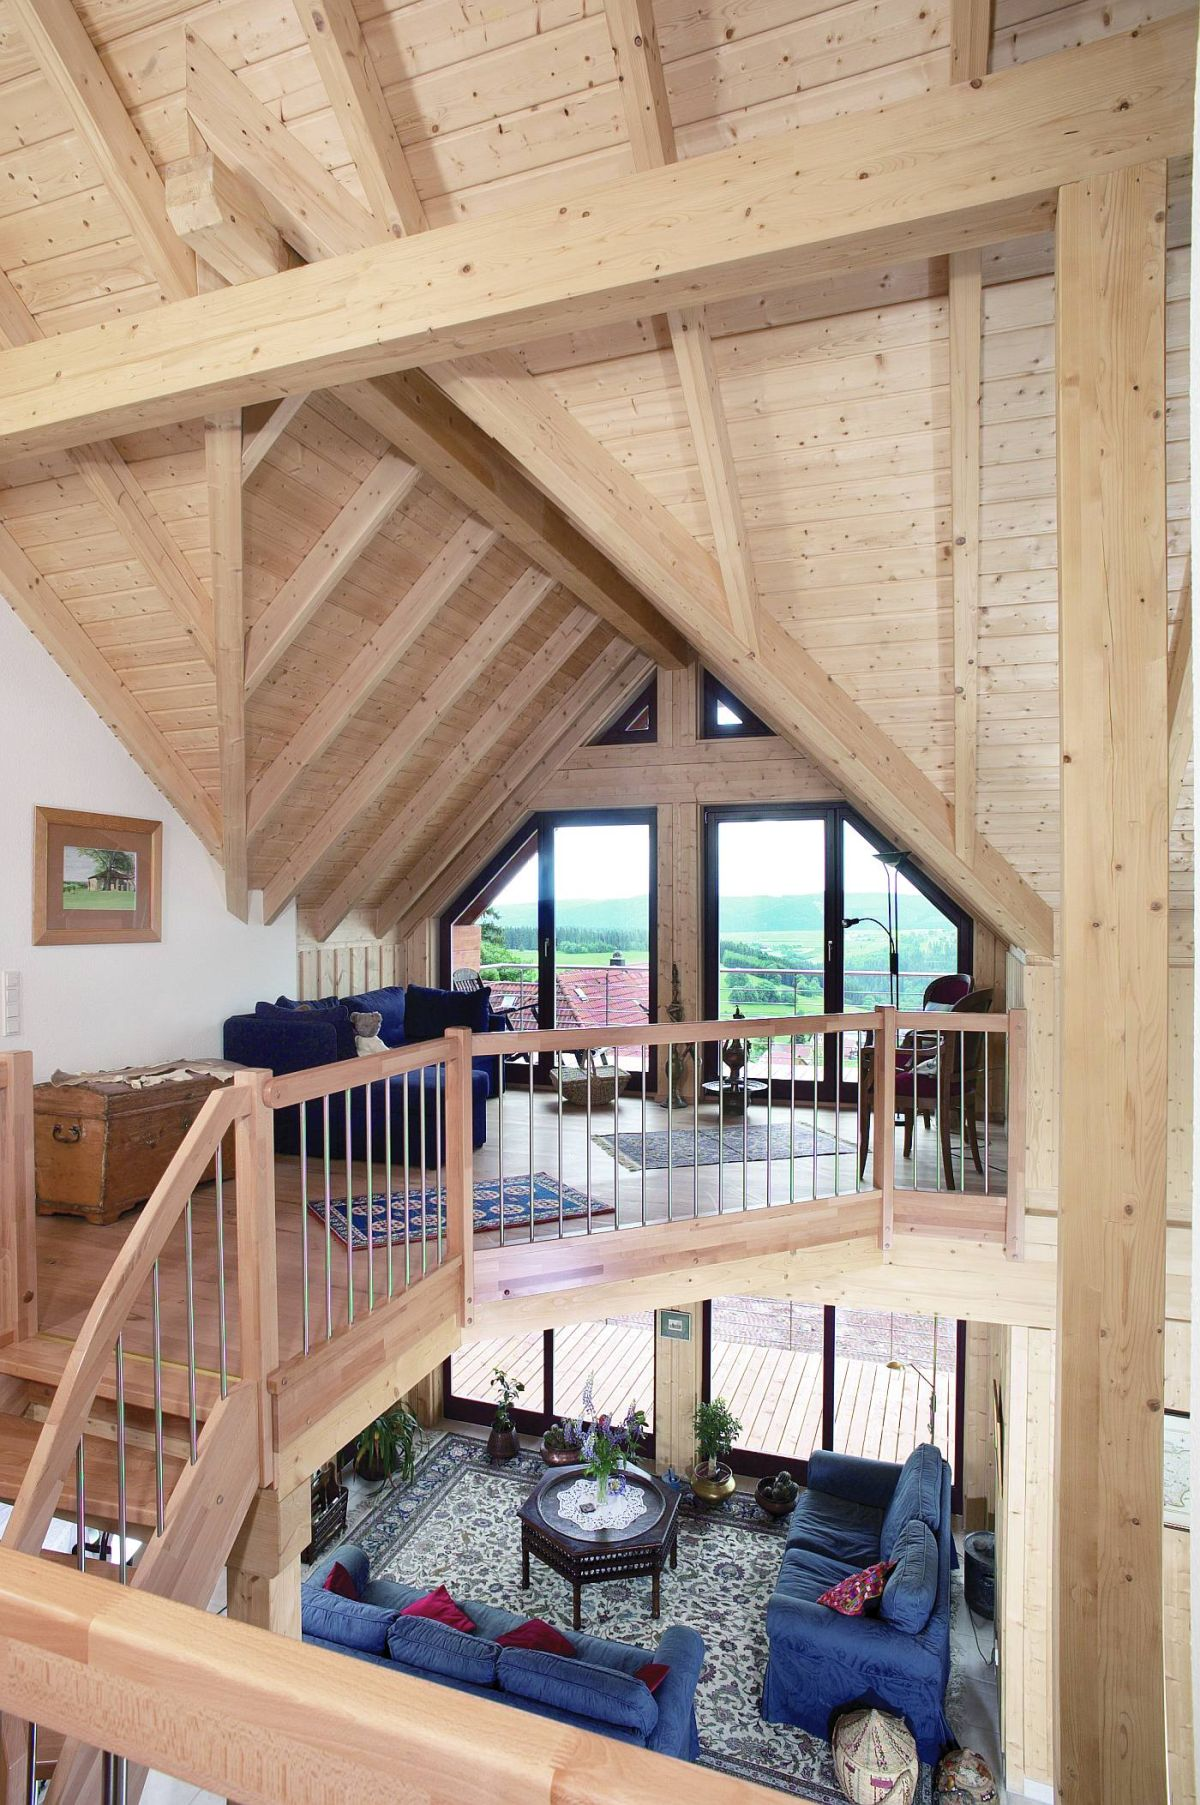 Stommel Haus blue spruce 3 bedrooms stommel haus uk